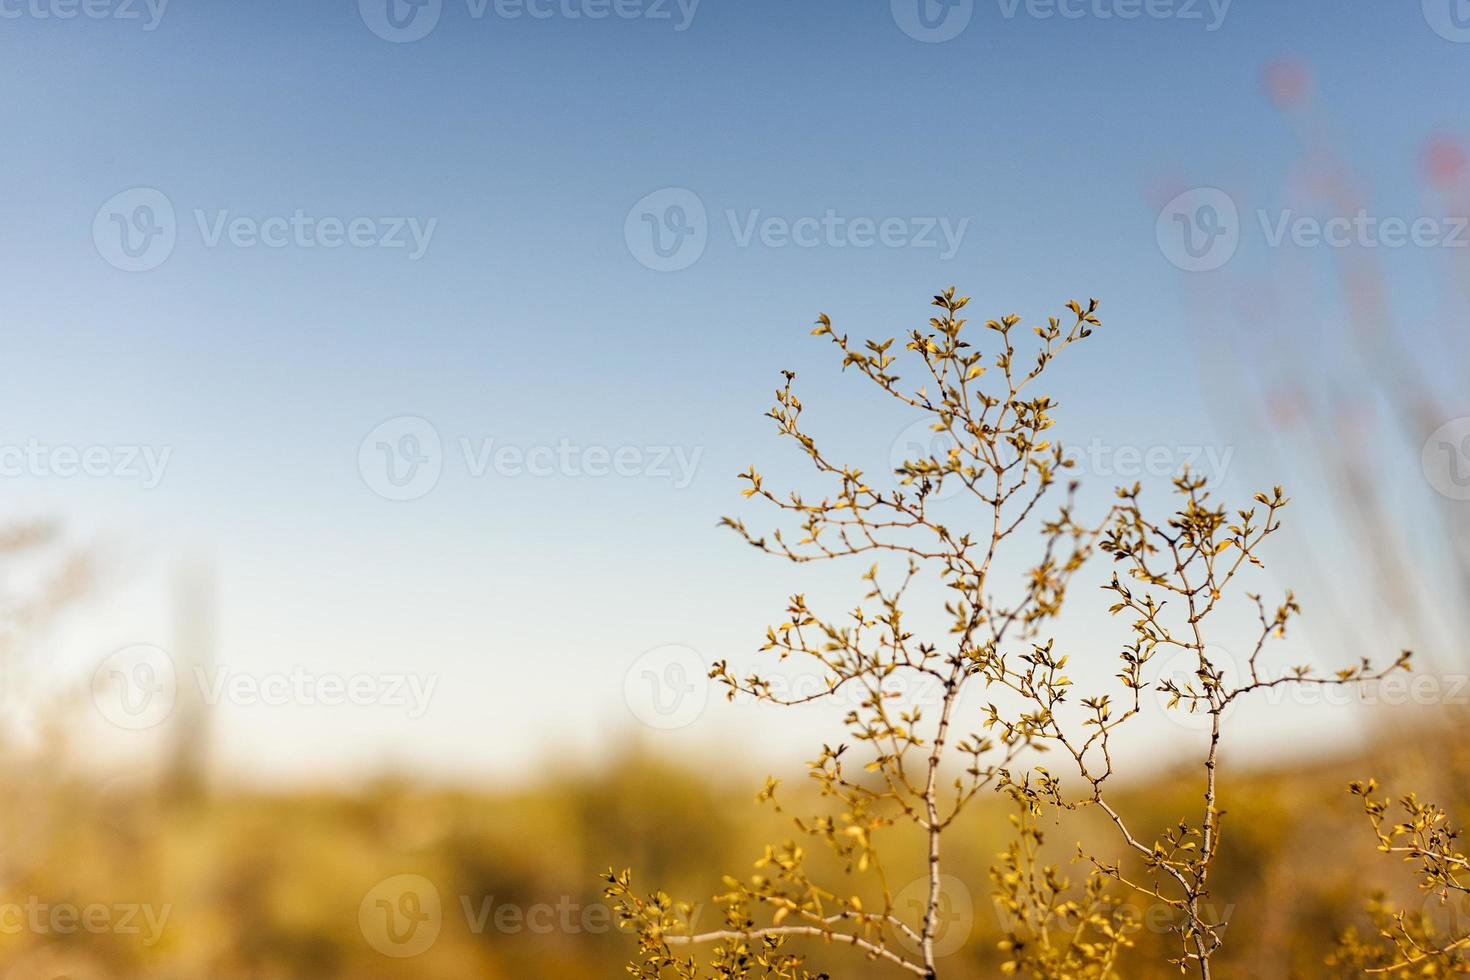 Wüste wärmt foto